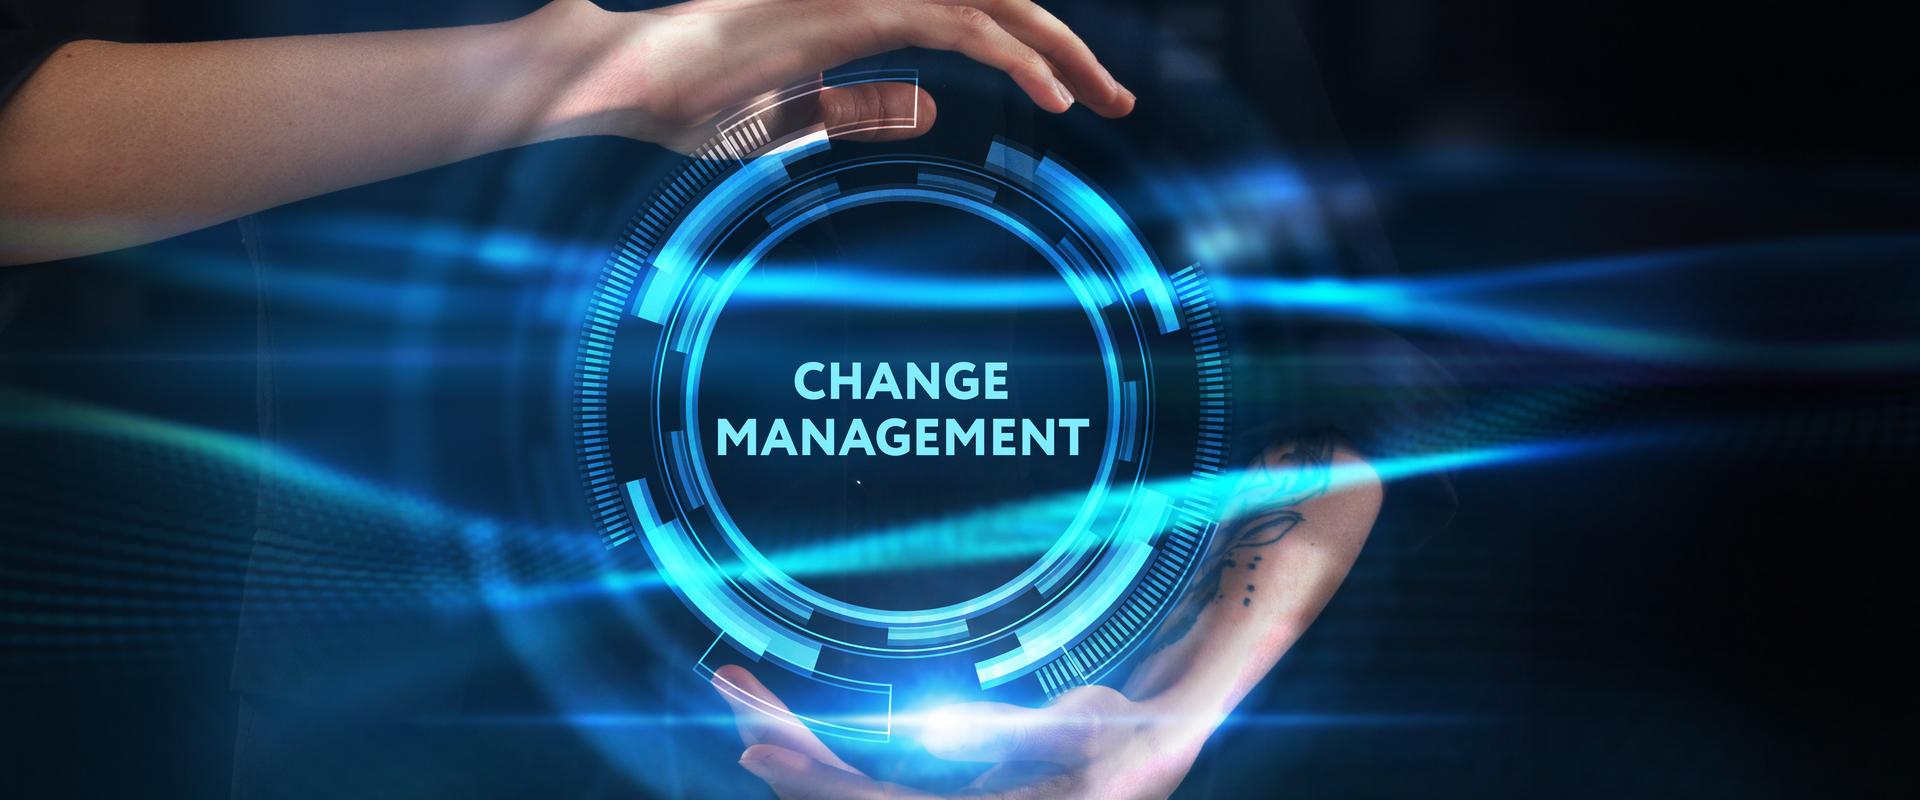 Change Management Support